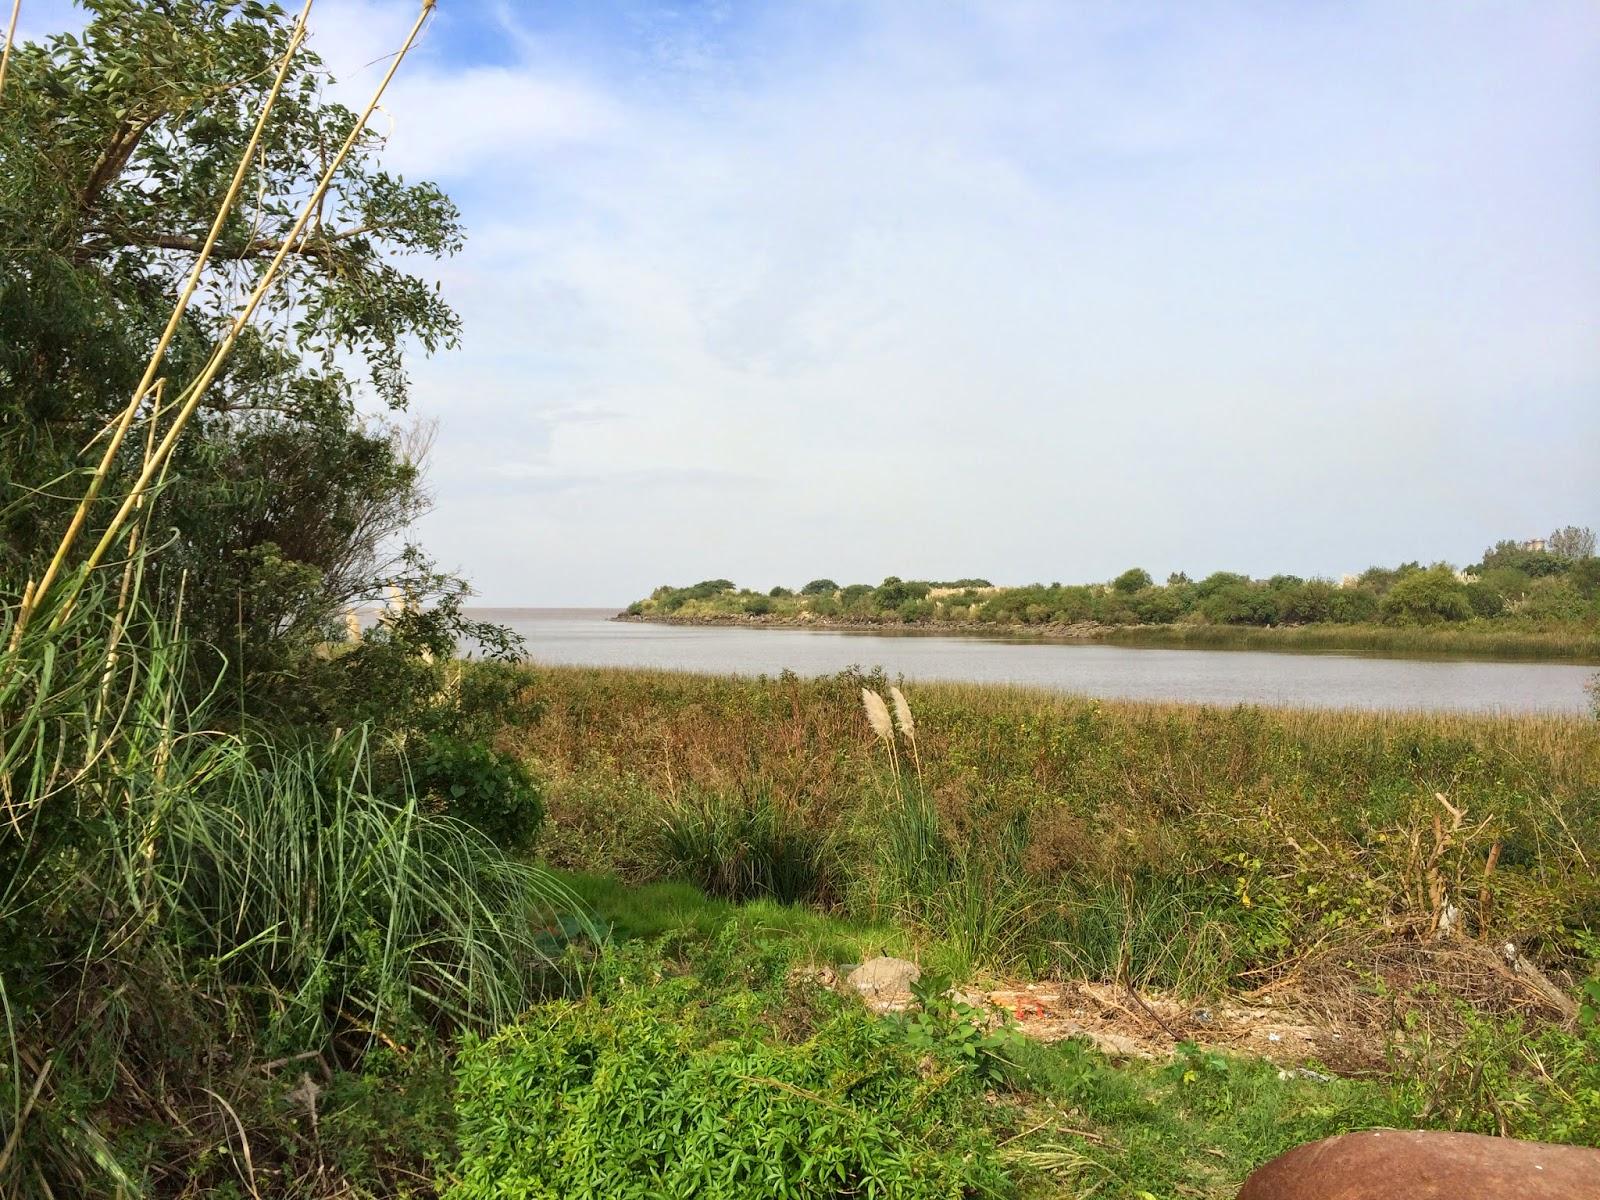 park_reserva_ecologica_argentina_7.jpg